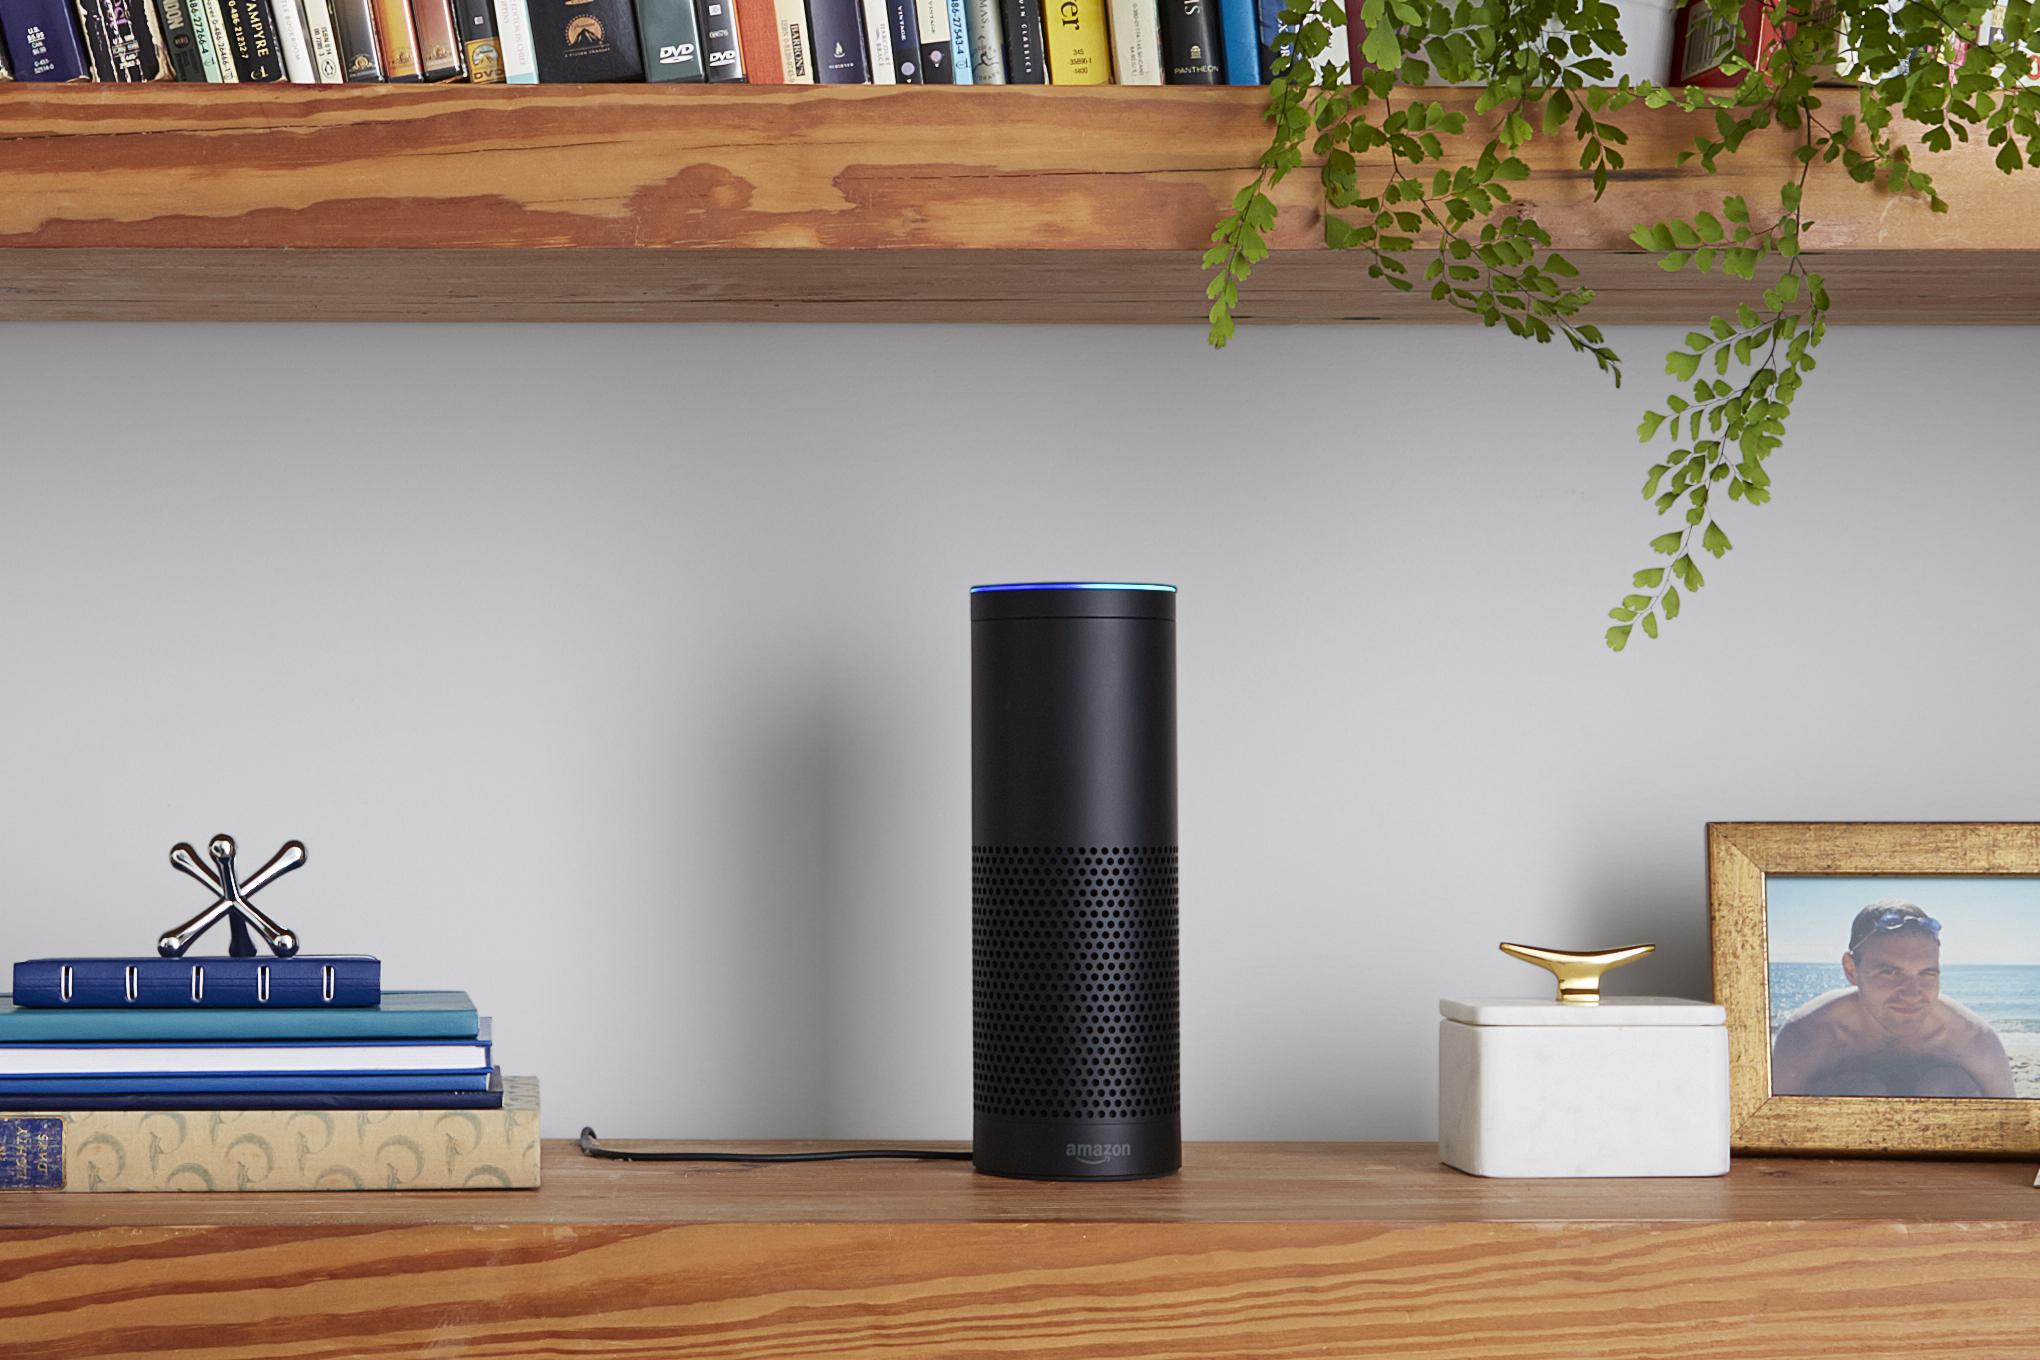 An Amazon Echo device on a bookshelf.